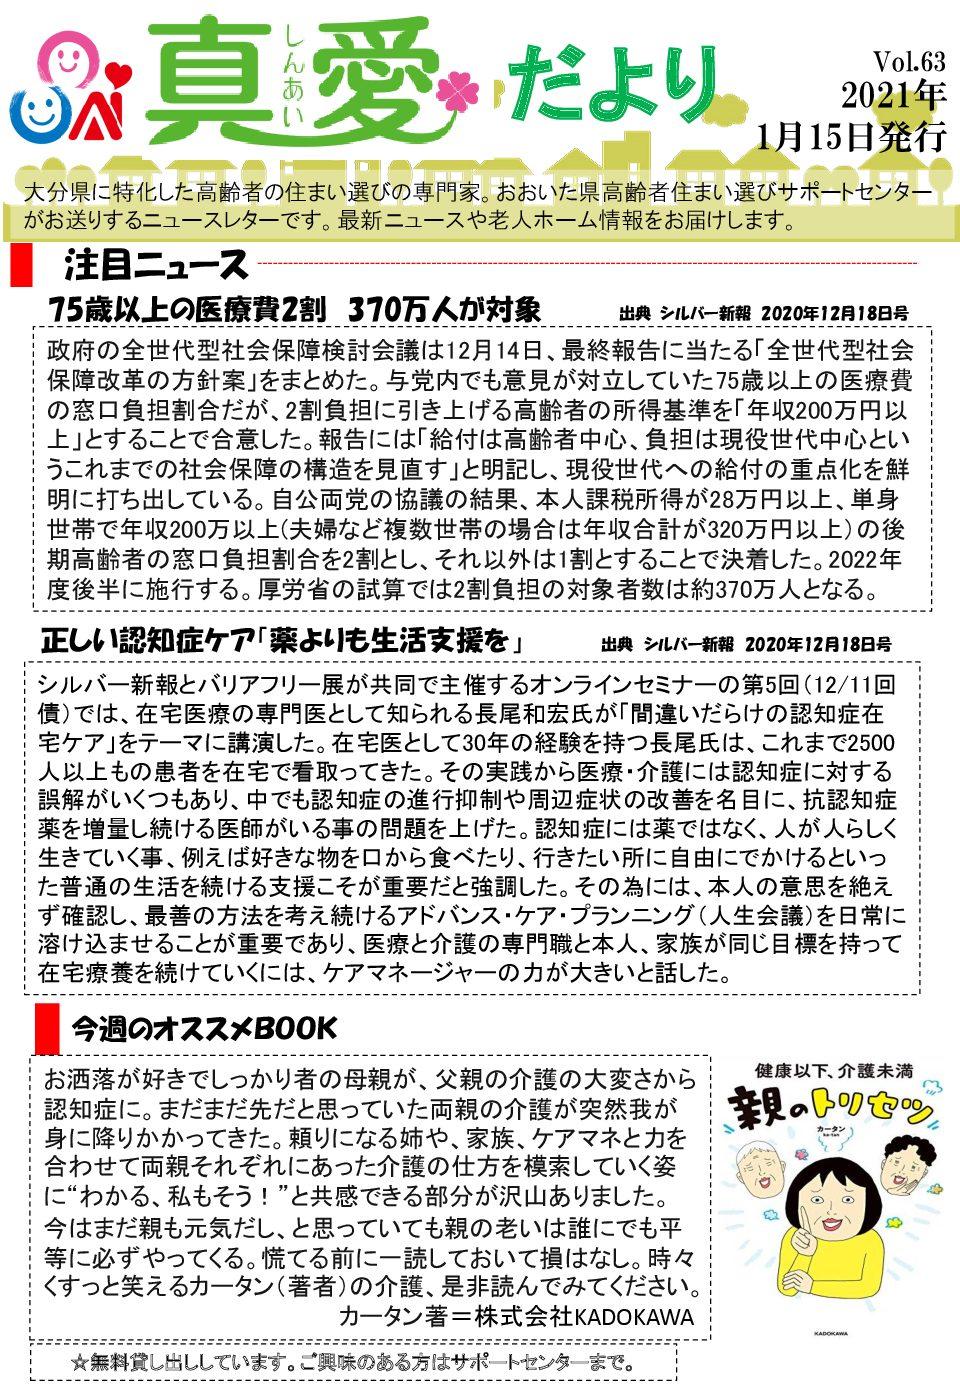 【vol.63】 2021.01.15発行